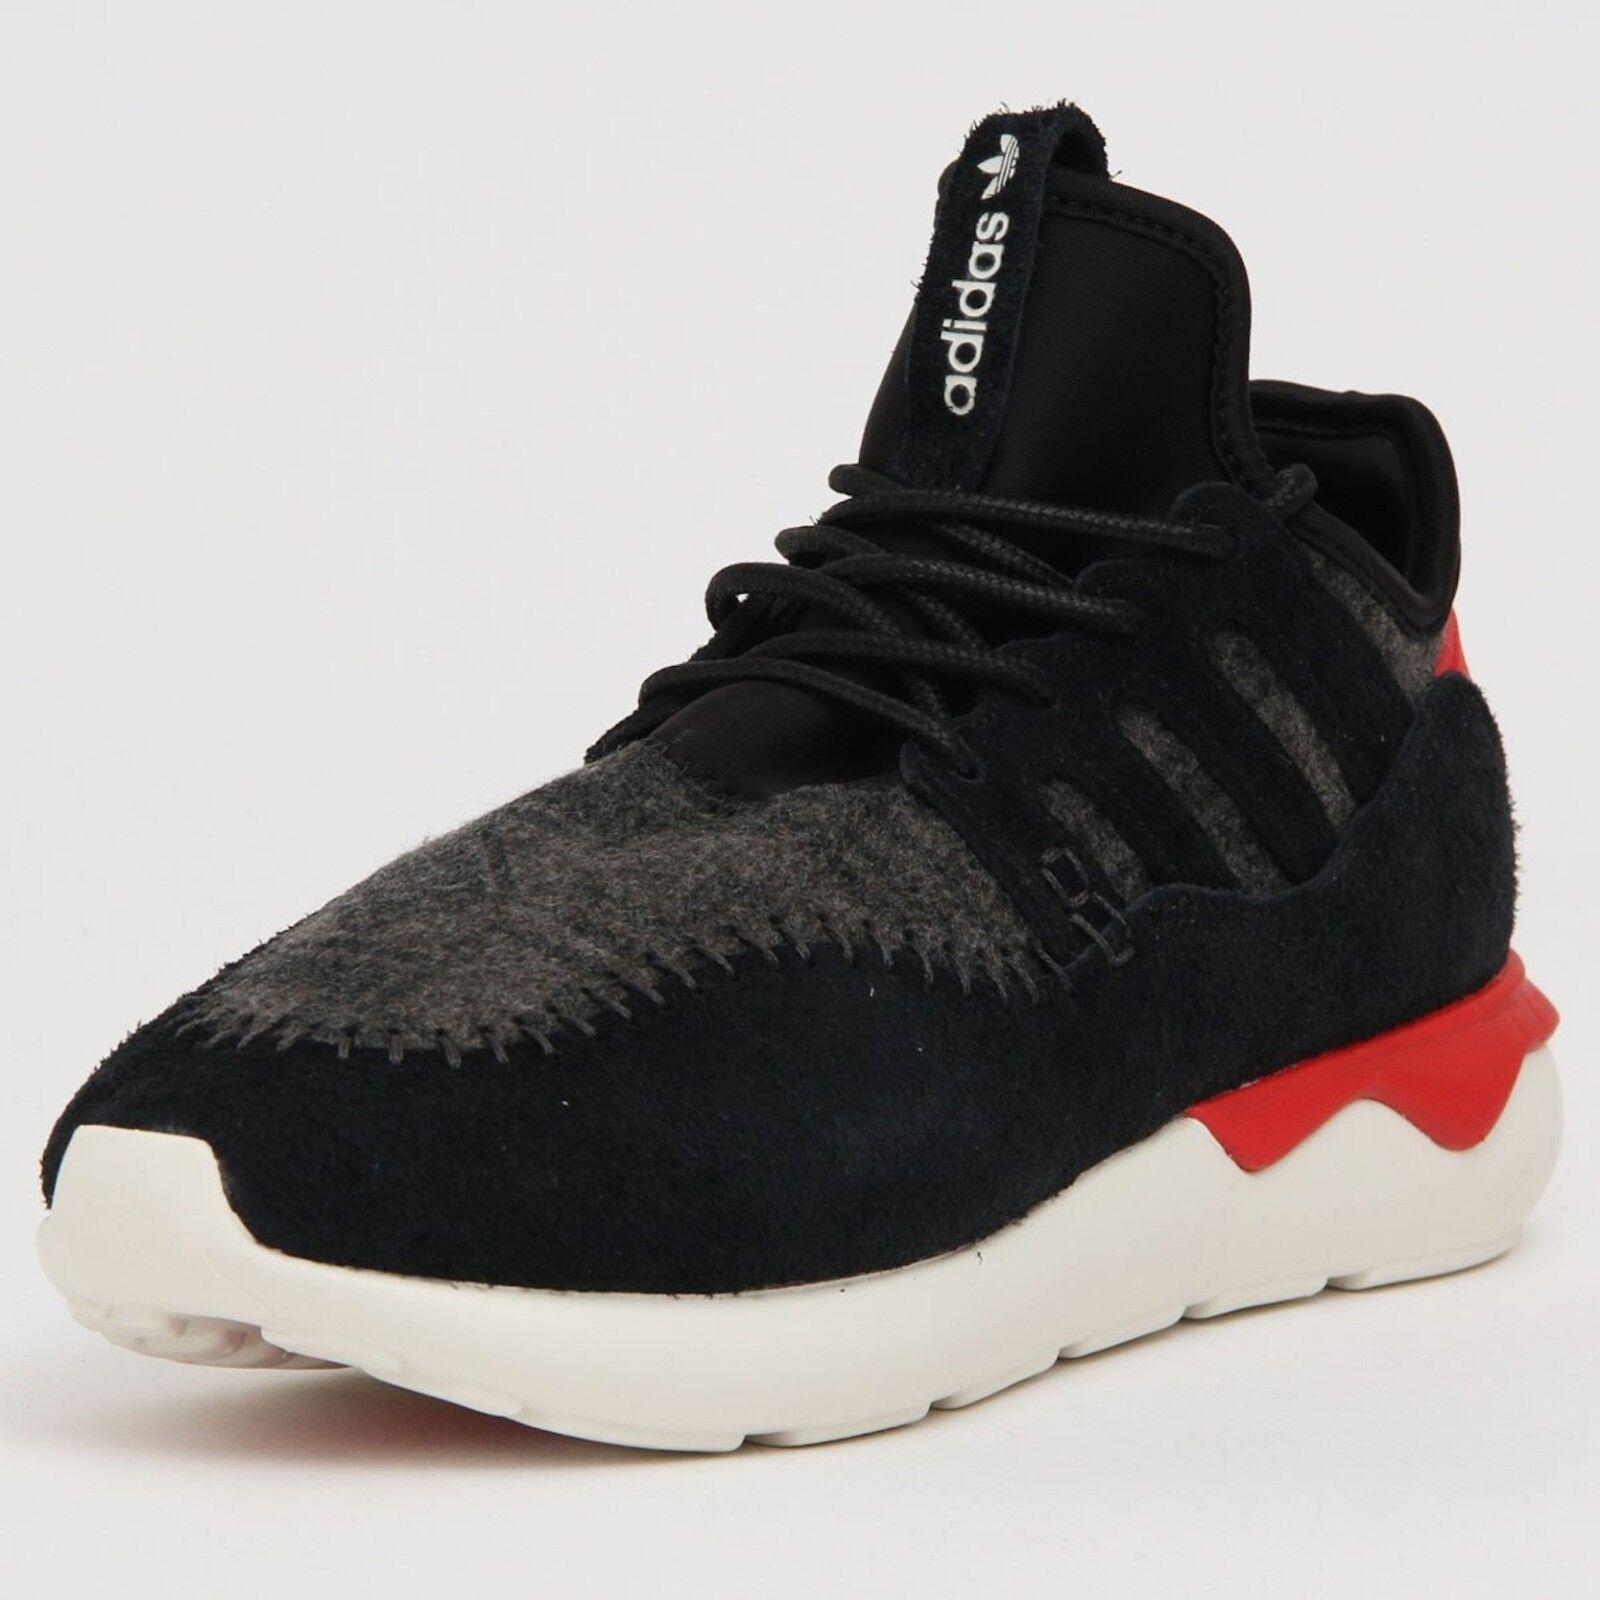 adidas B24693 Tubular Moccasin Runner Running Sneaker Black & Tomato Red 11 NWT